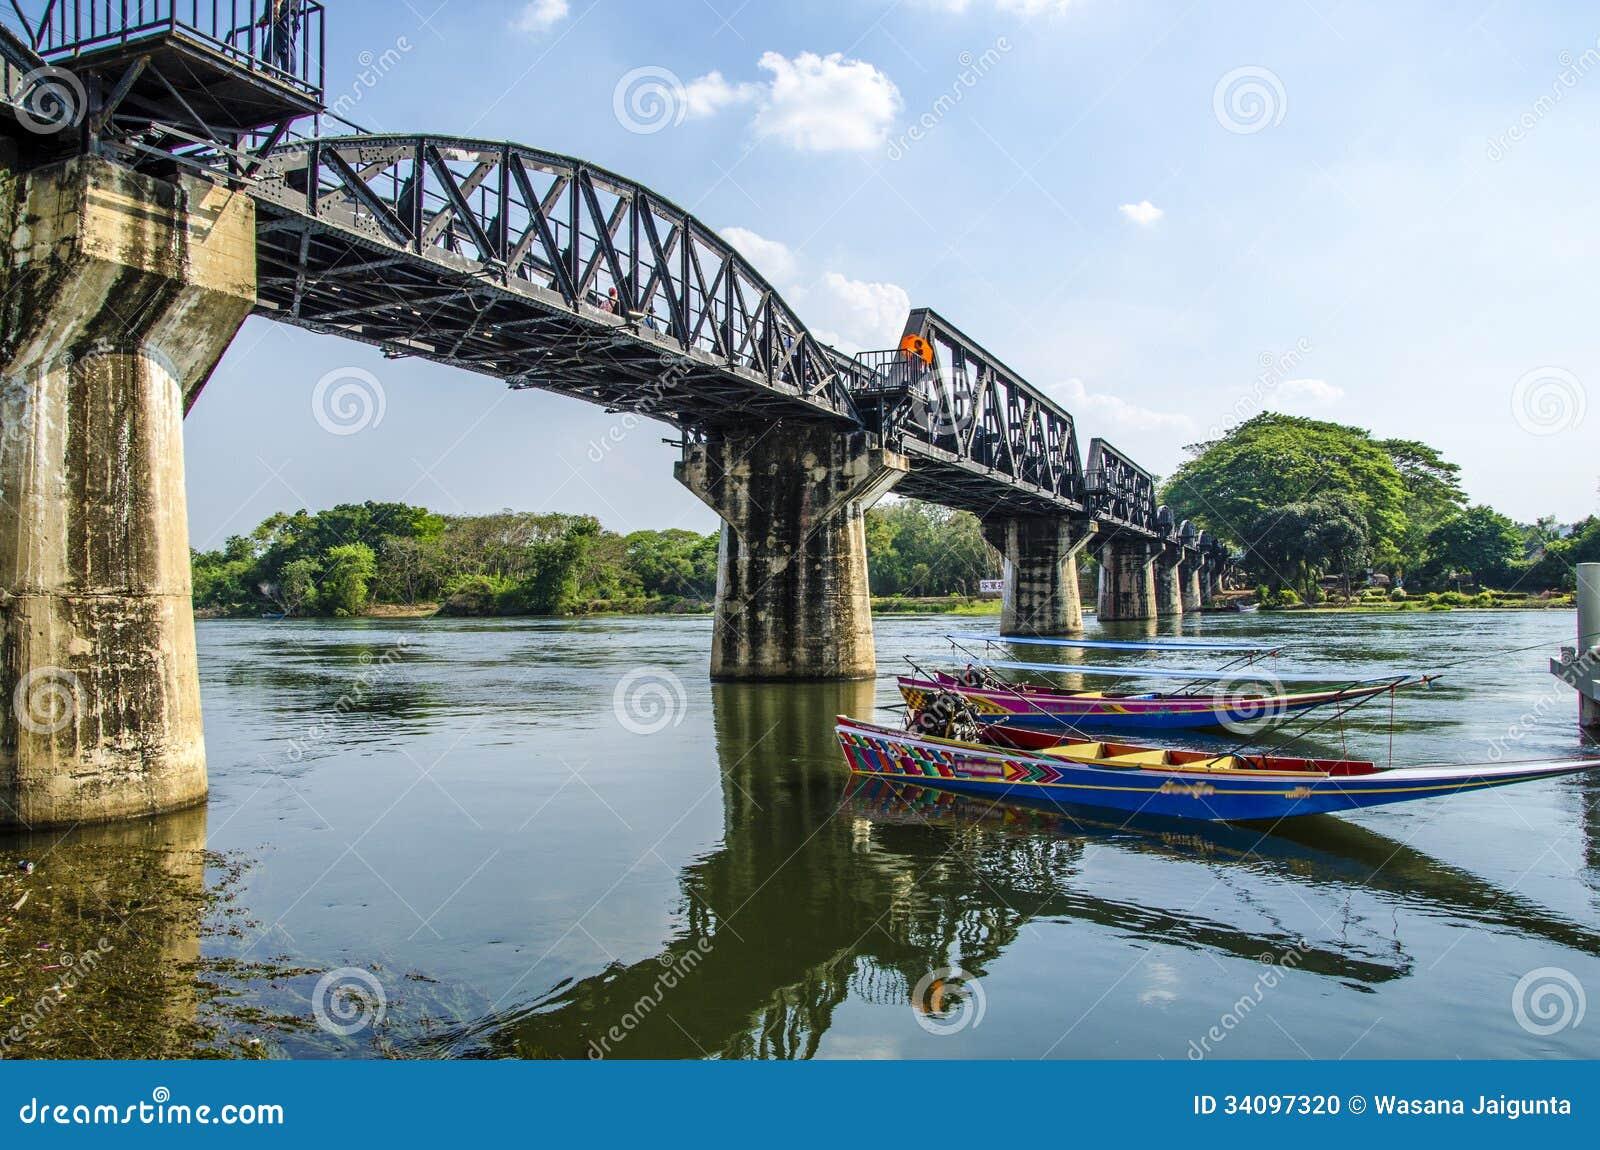 The Bridge of the River Kwai, Kanchanaburi, Thailand